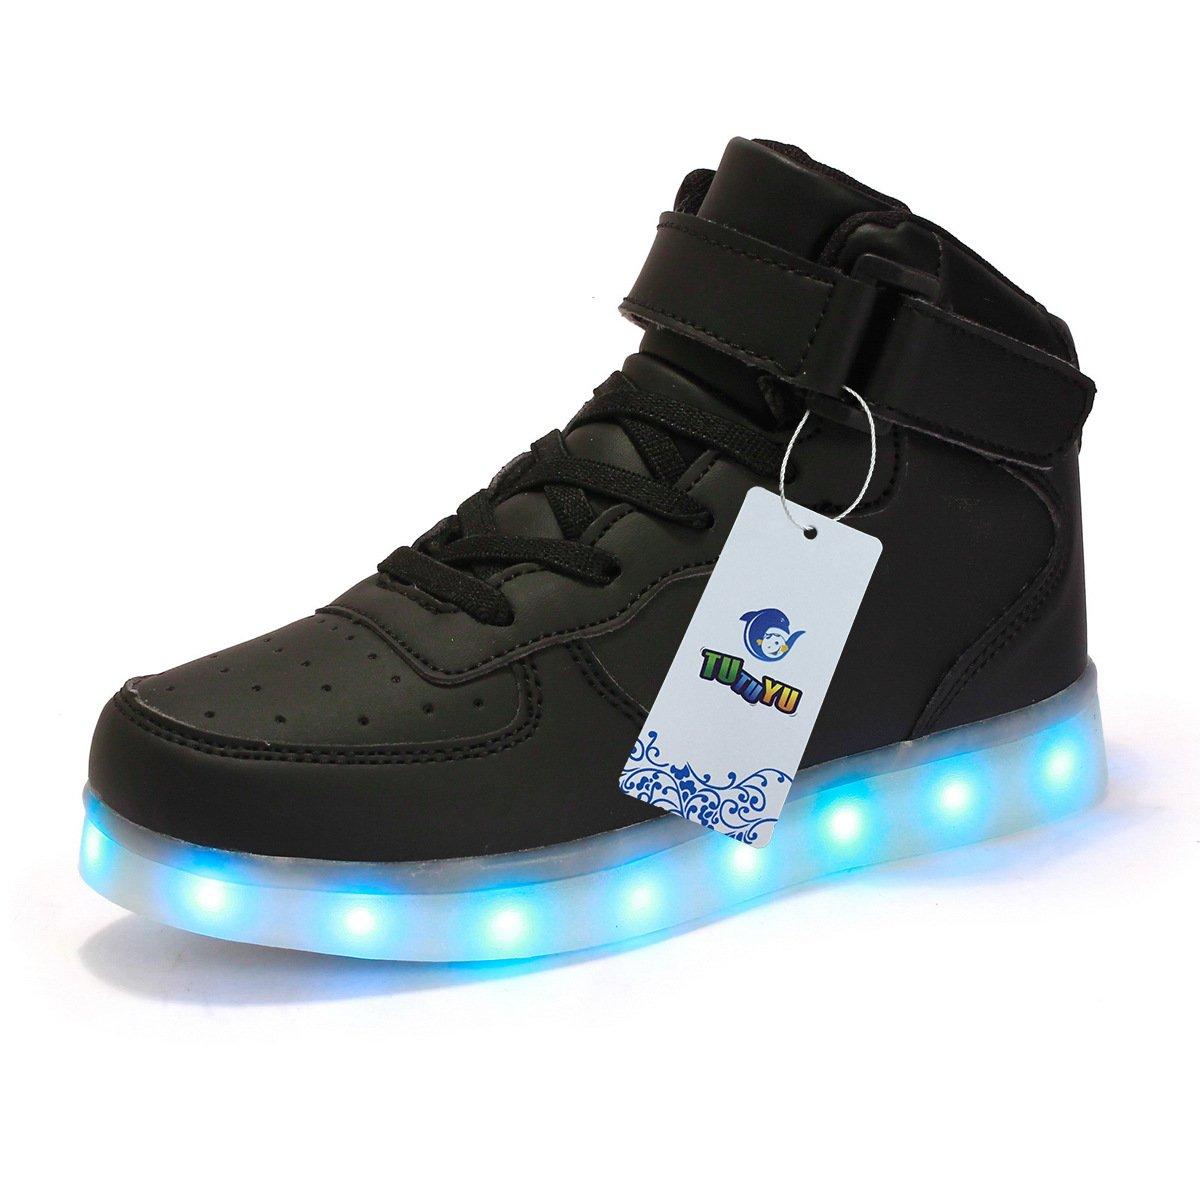 Kids 11 Colors LED Light Up Shoes High